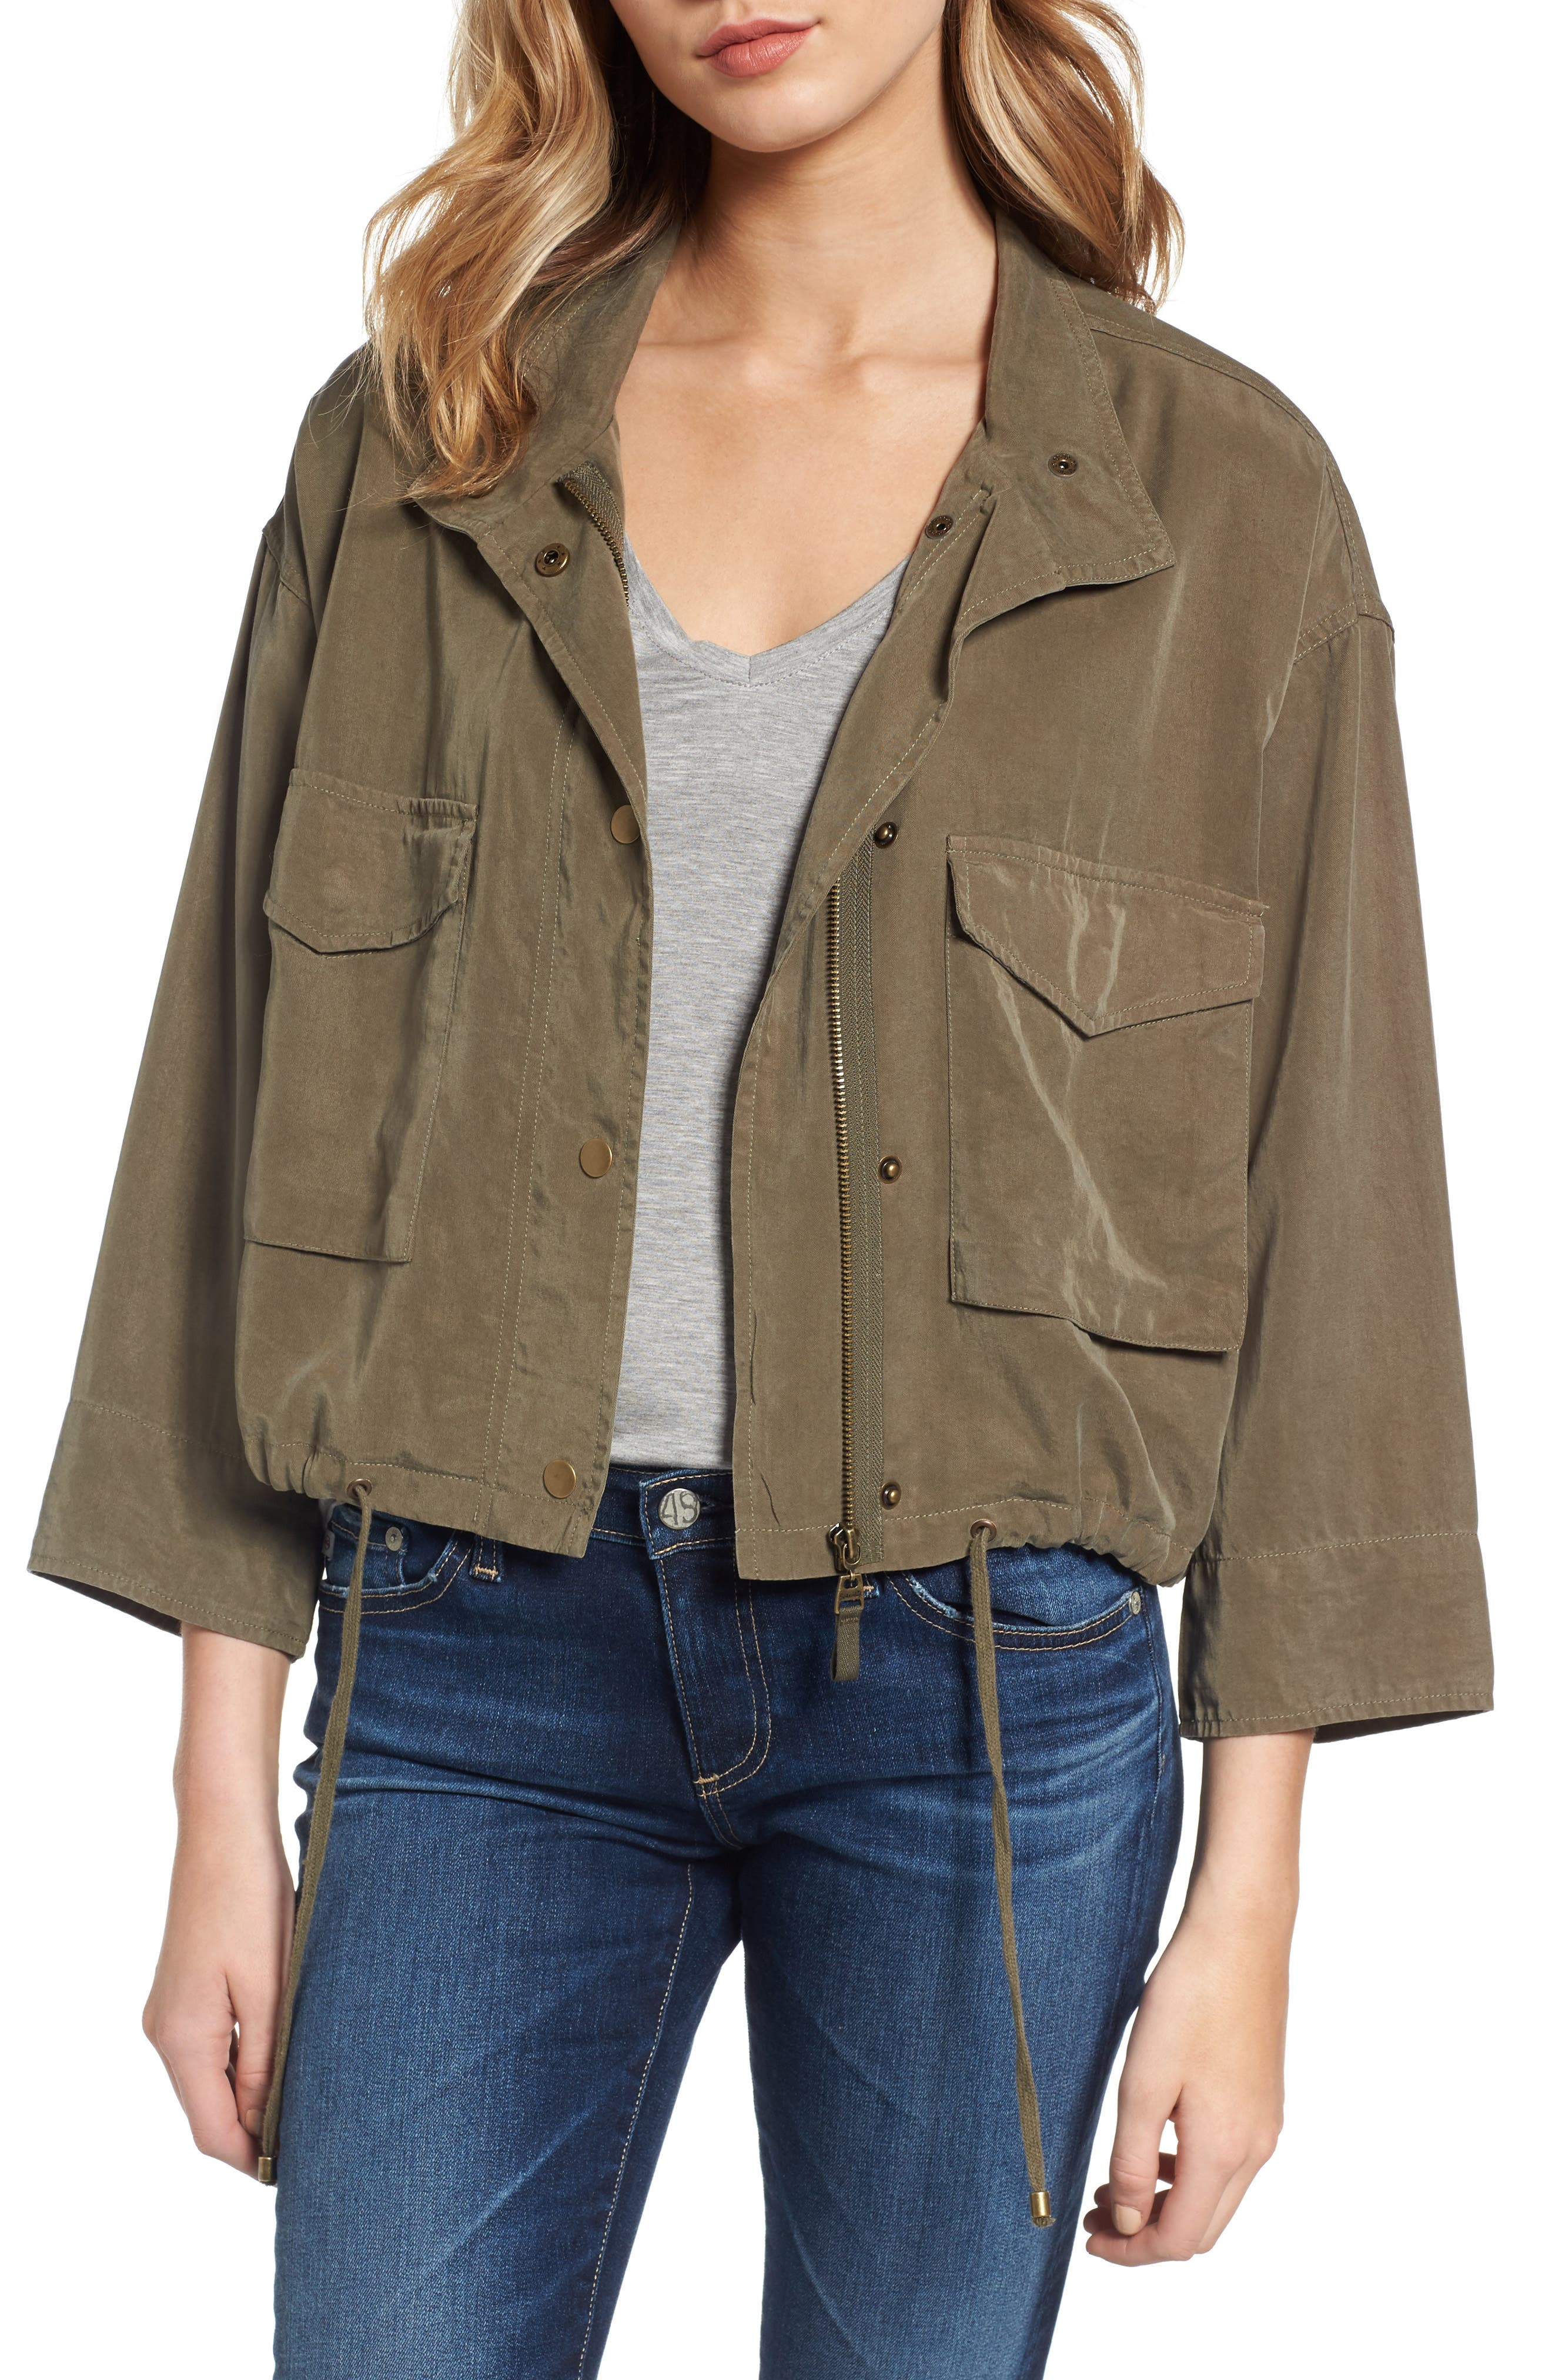 Splendid Crop Military Jacket